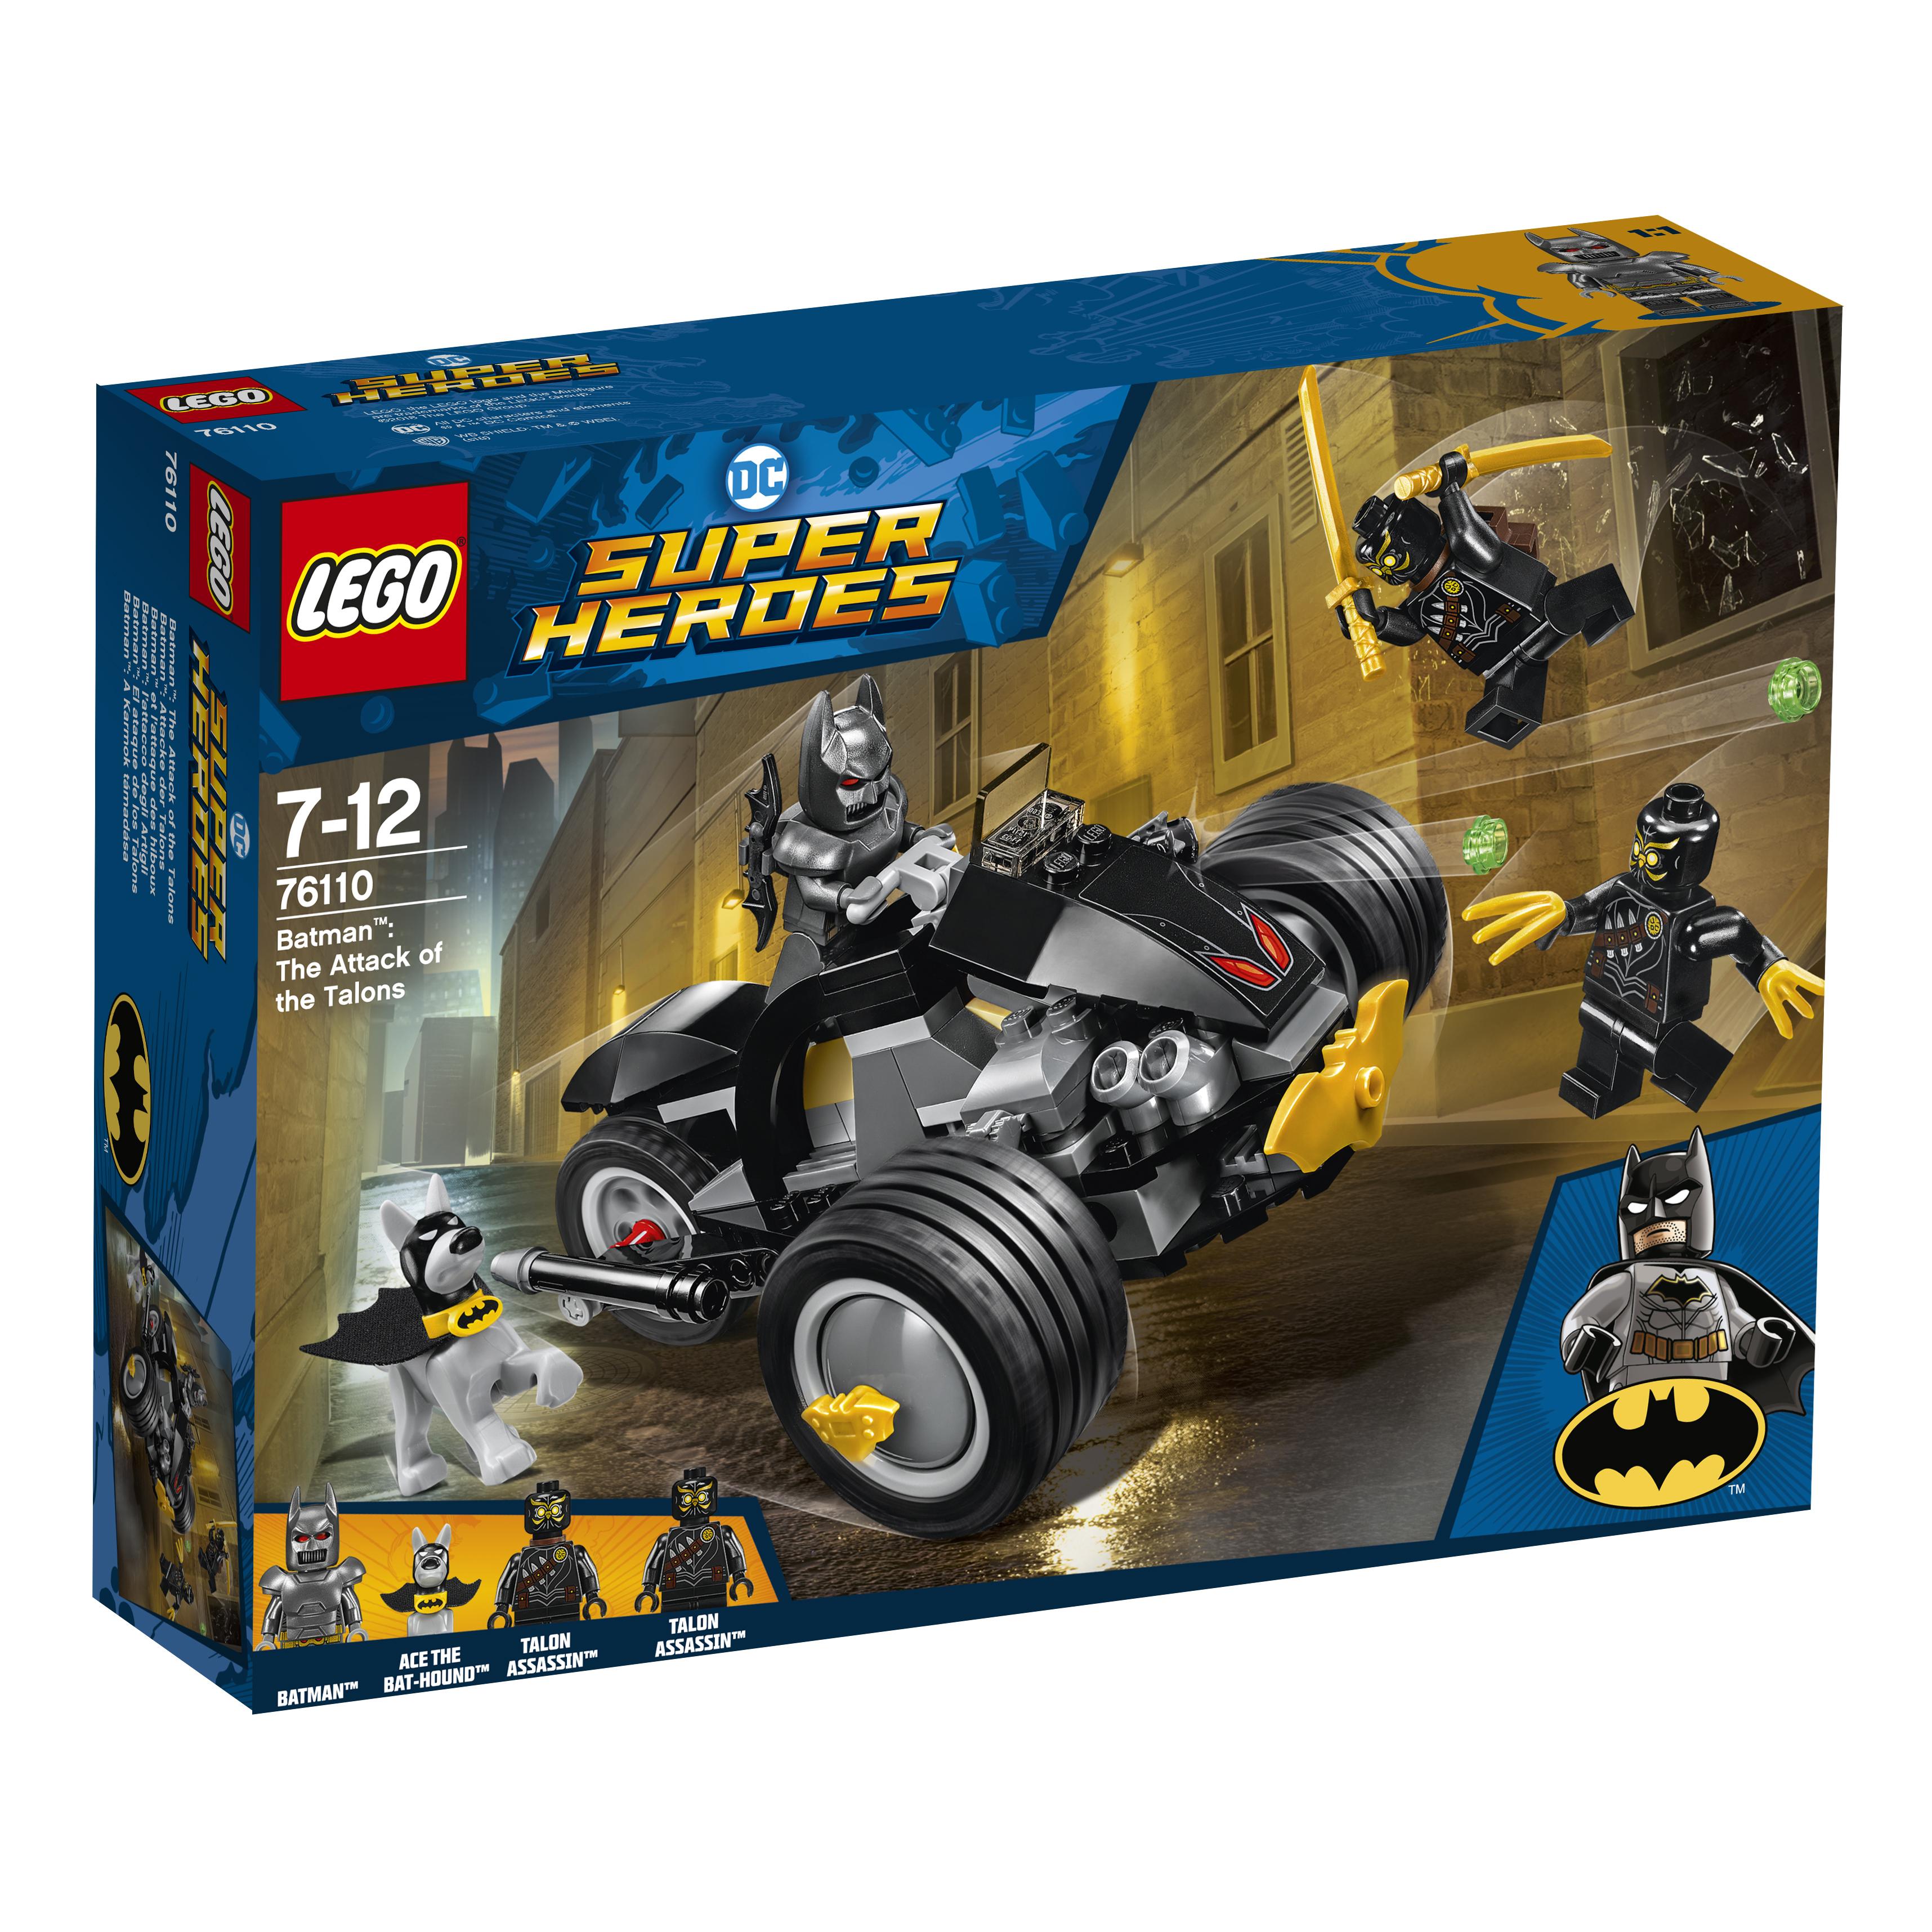 Конструктор LEGO Super Heroes 76110 Бетмен: Нападение Когтей